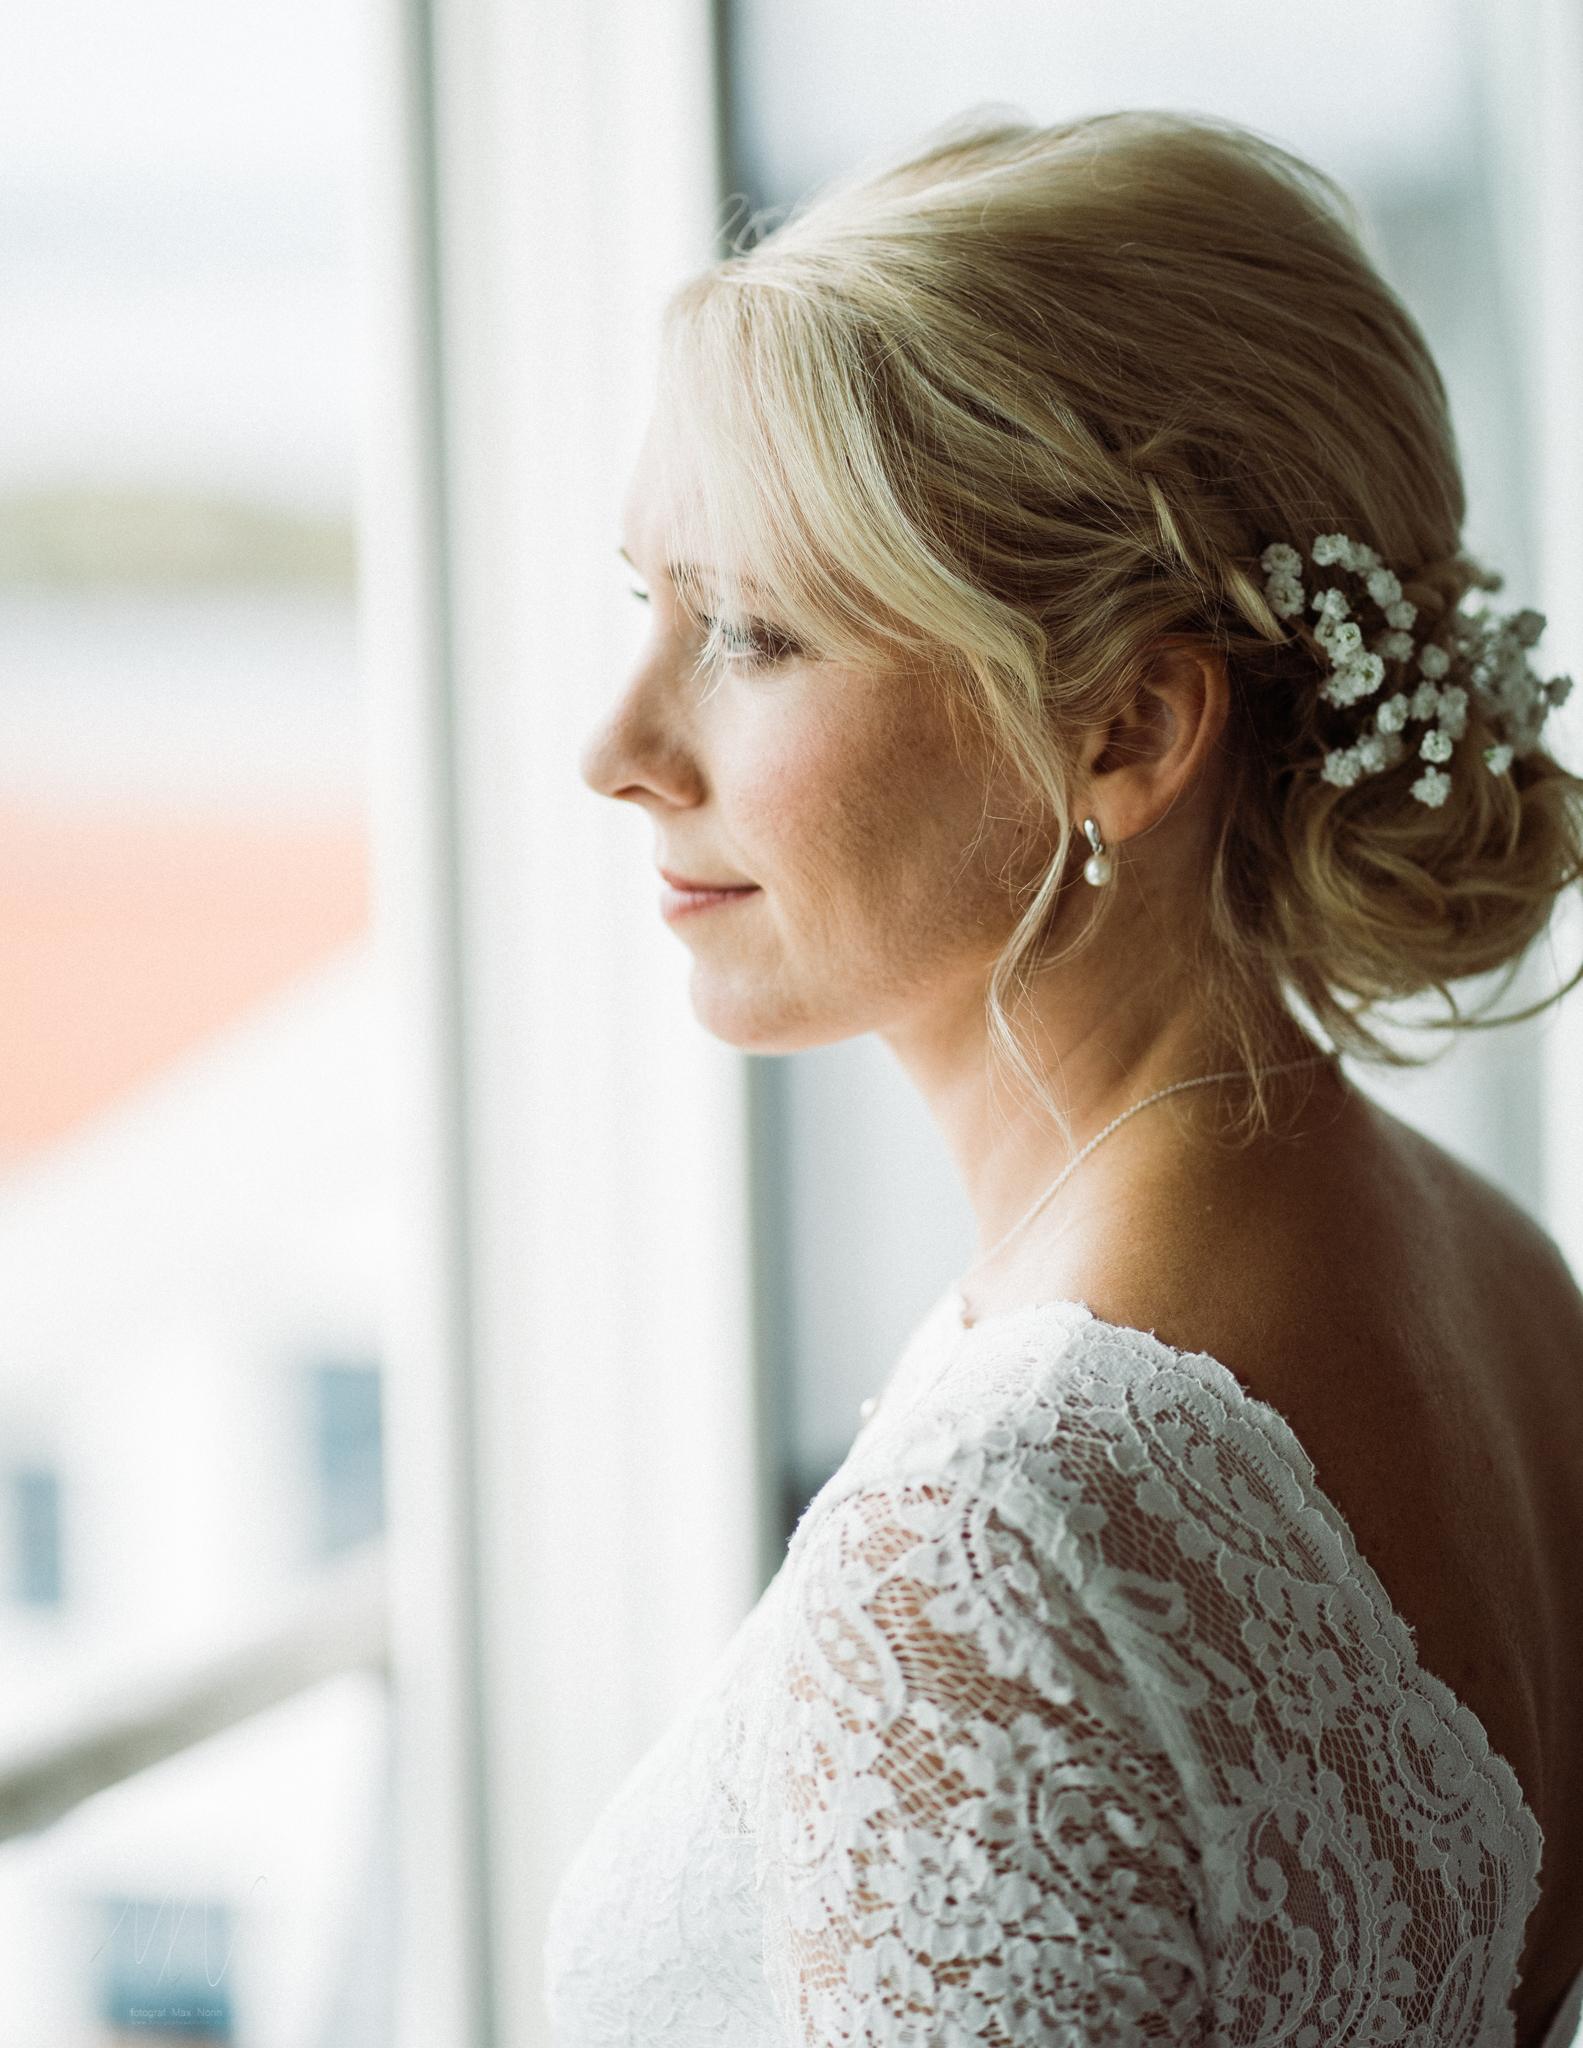 Bröllop-fotografmaxnorin.se-MariaMarcus-19.JPG